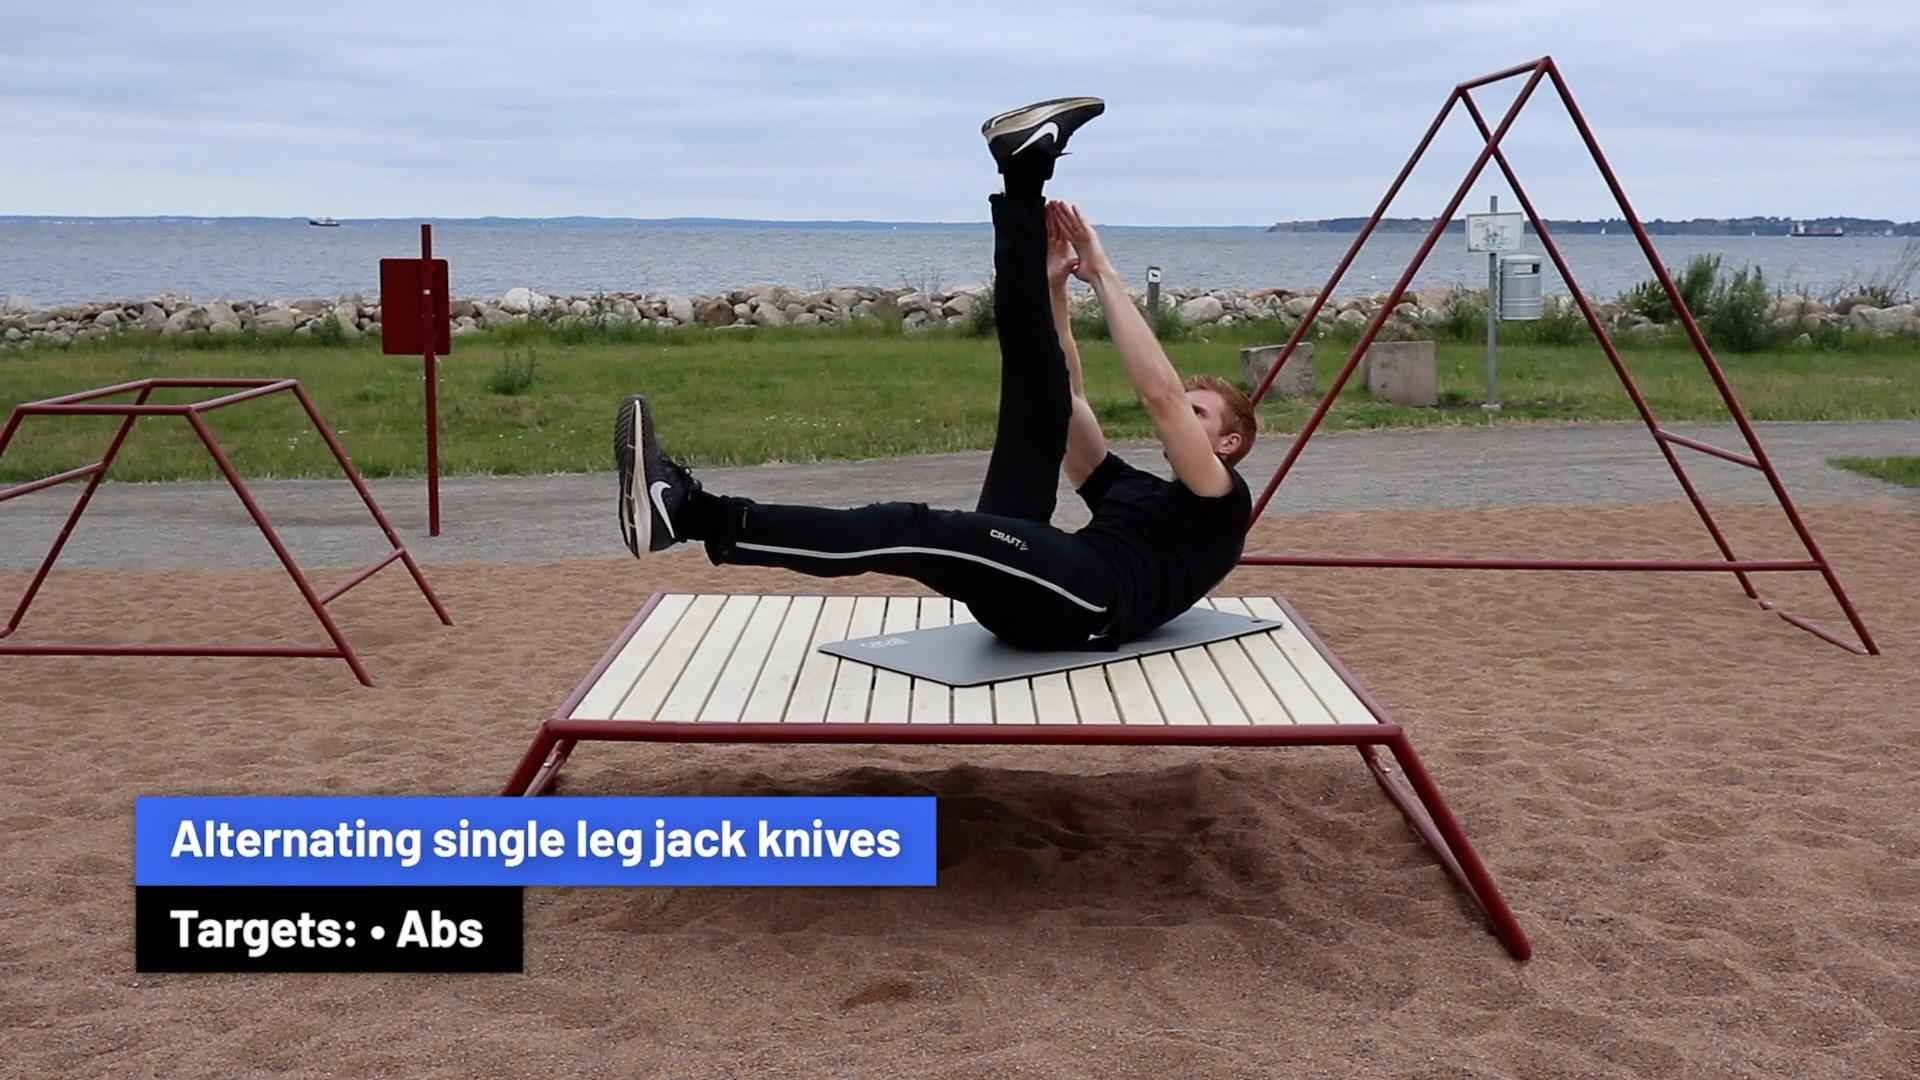 Alternating single leg jack knives